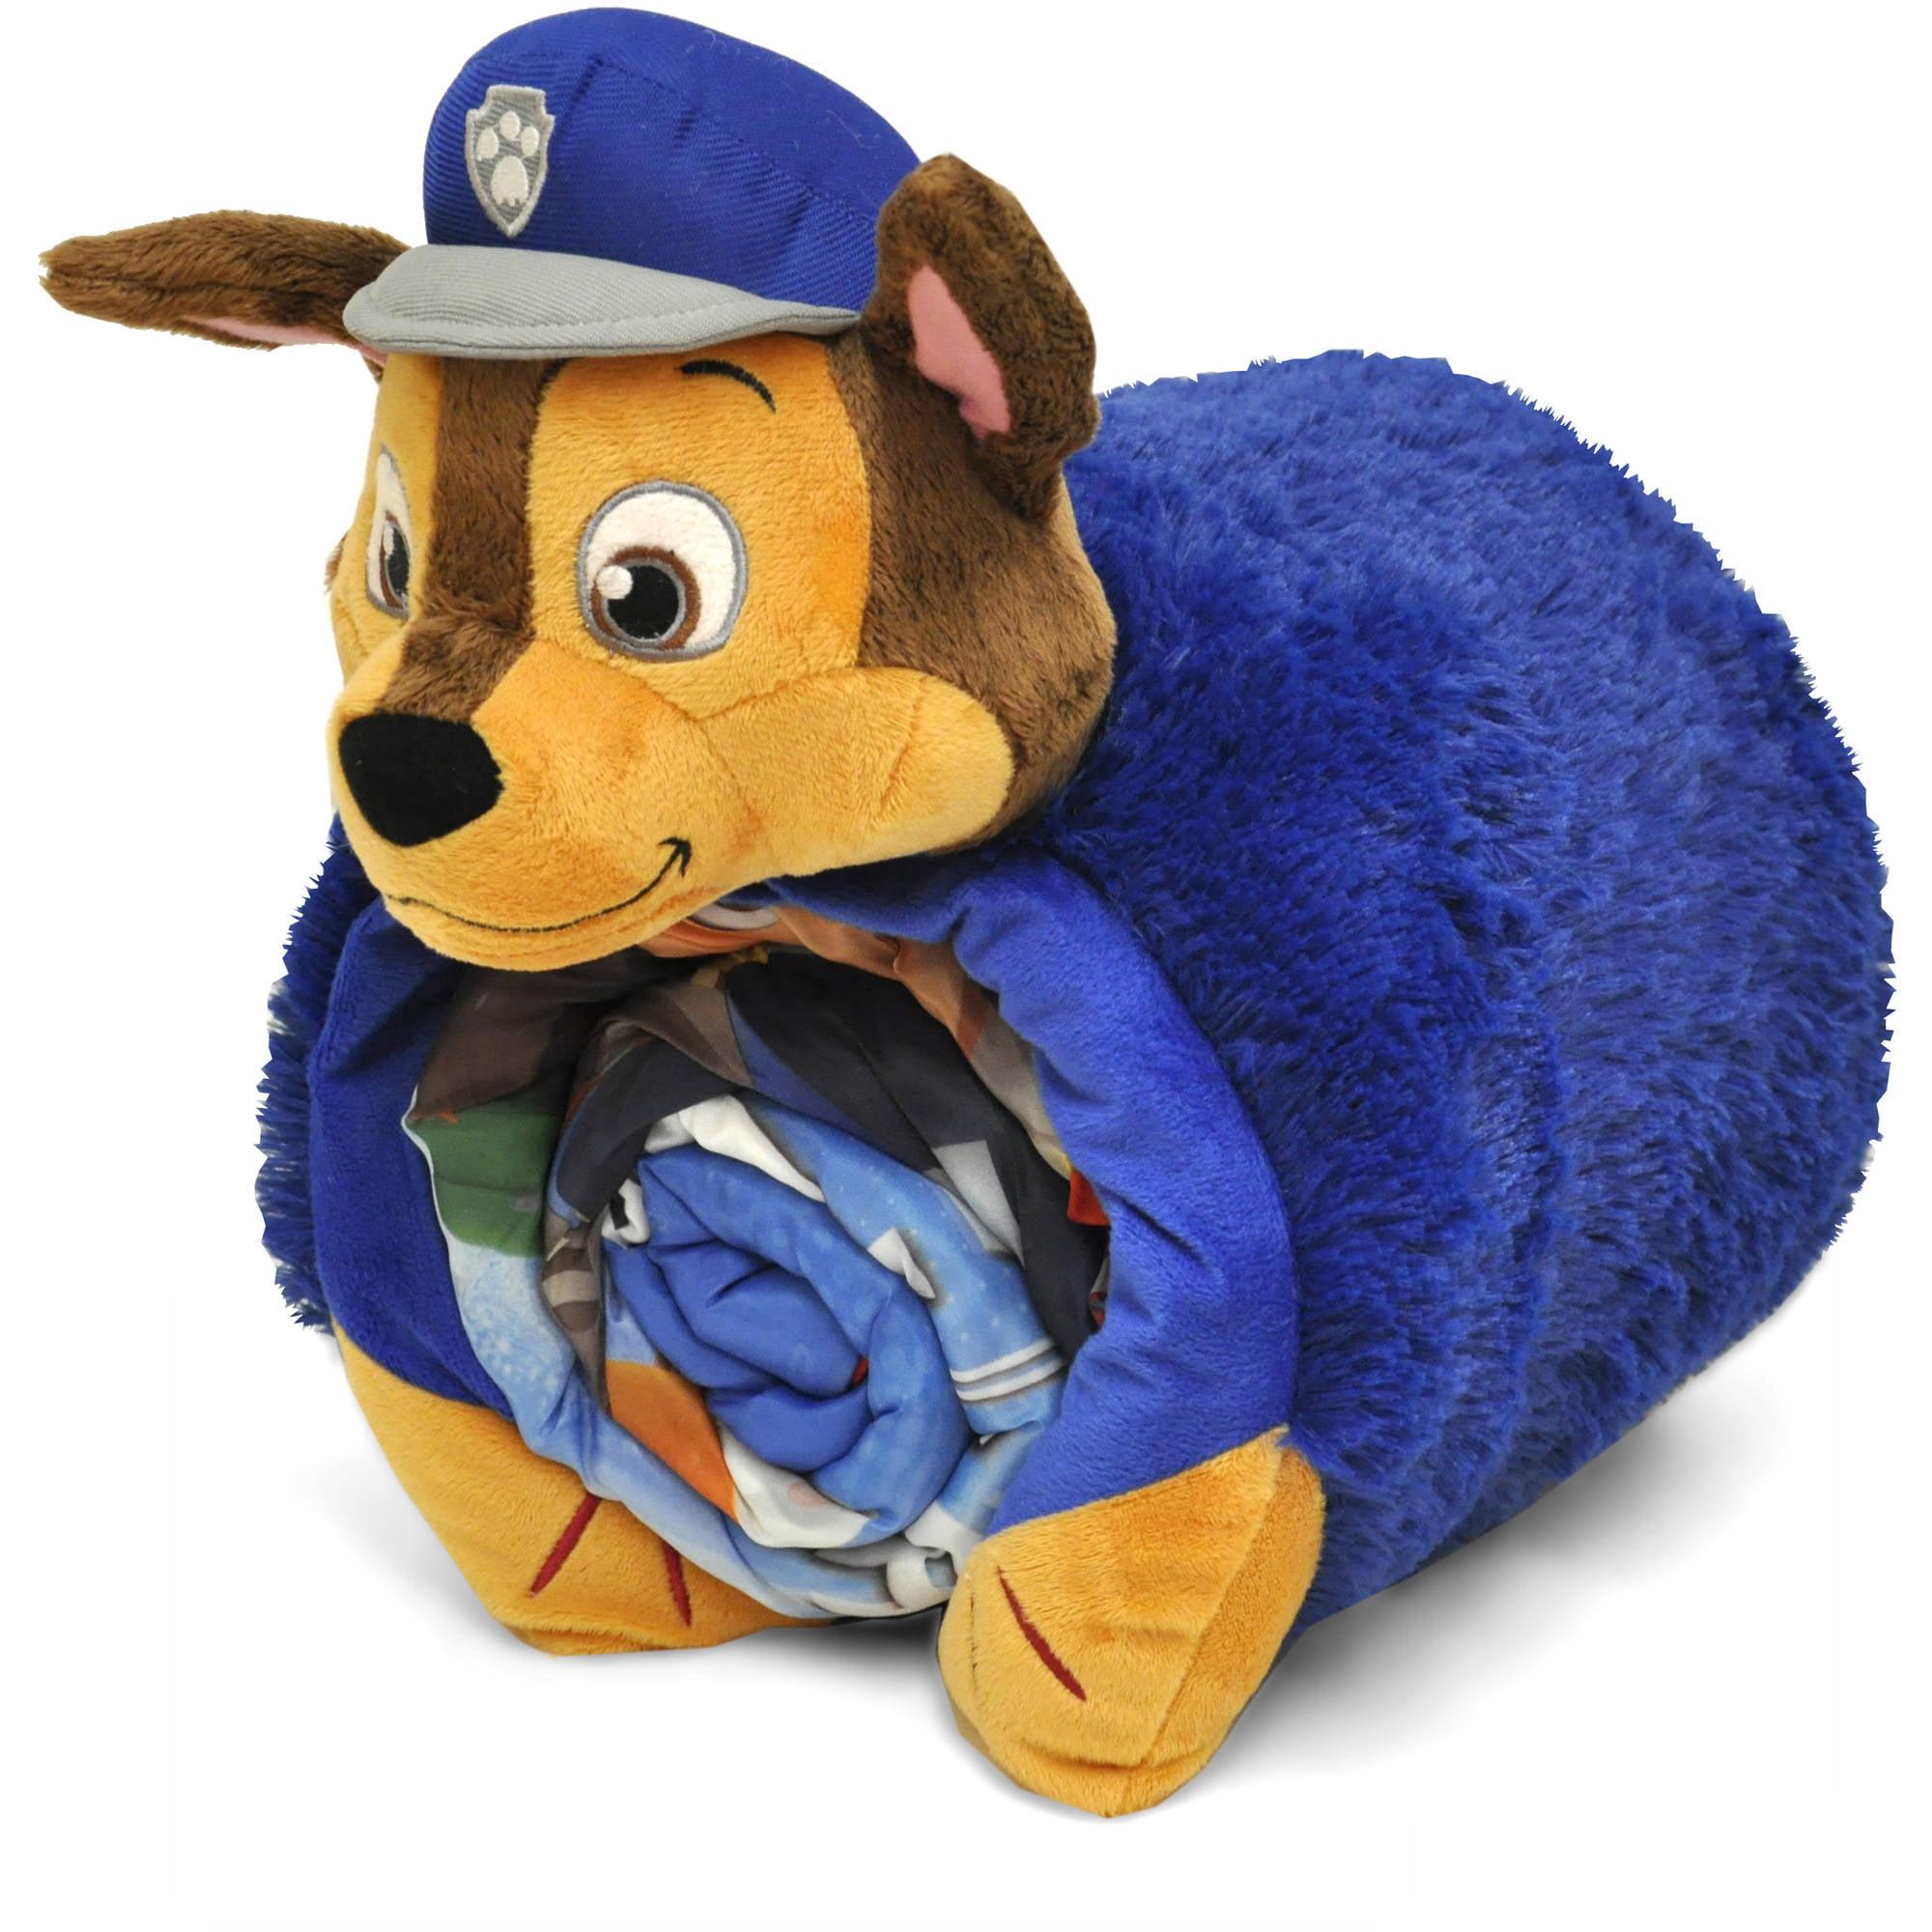 2a4d8adcd6 Paw Patrol Sleeping Bag with BONUS Cuddle Pillow - Walmart.com